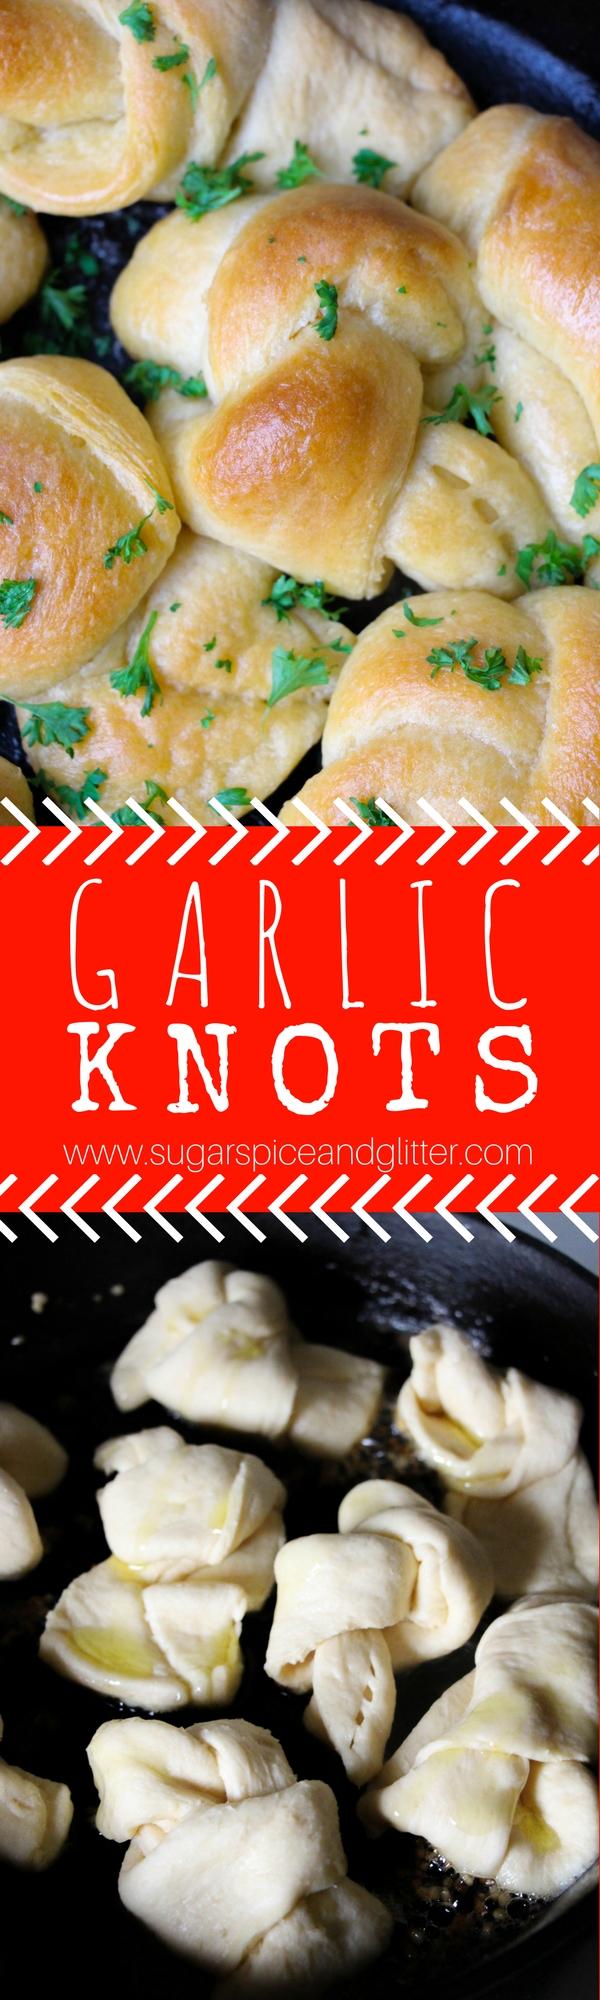 Garlic Knots Sugar Spice And Glitter